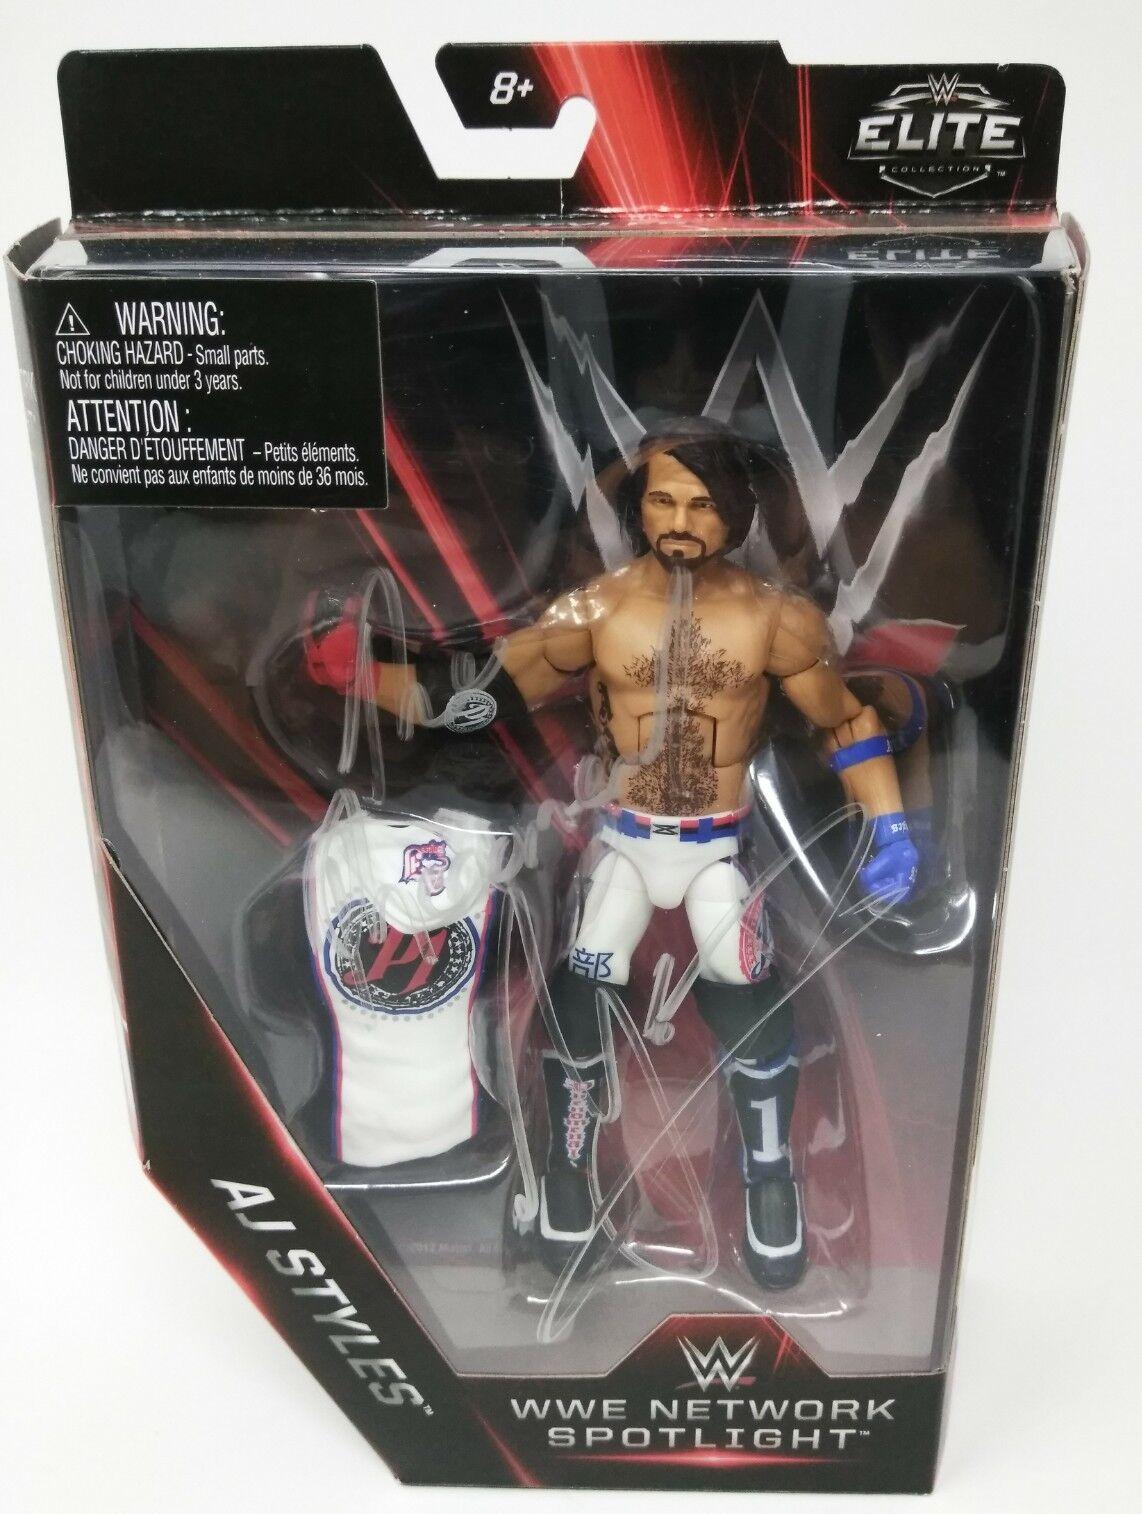 Signed WWE- AJ STYLES Elite NETWORK SPOTLIGHT Series Wrestling Figure HTF W6